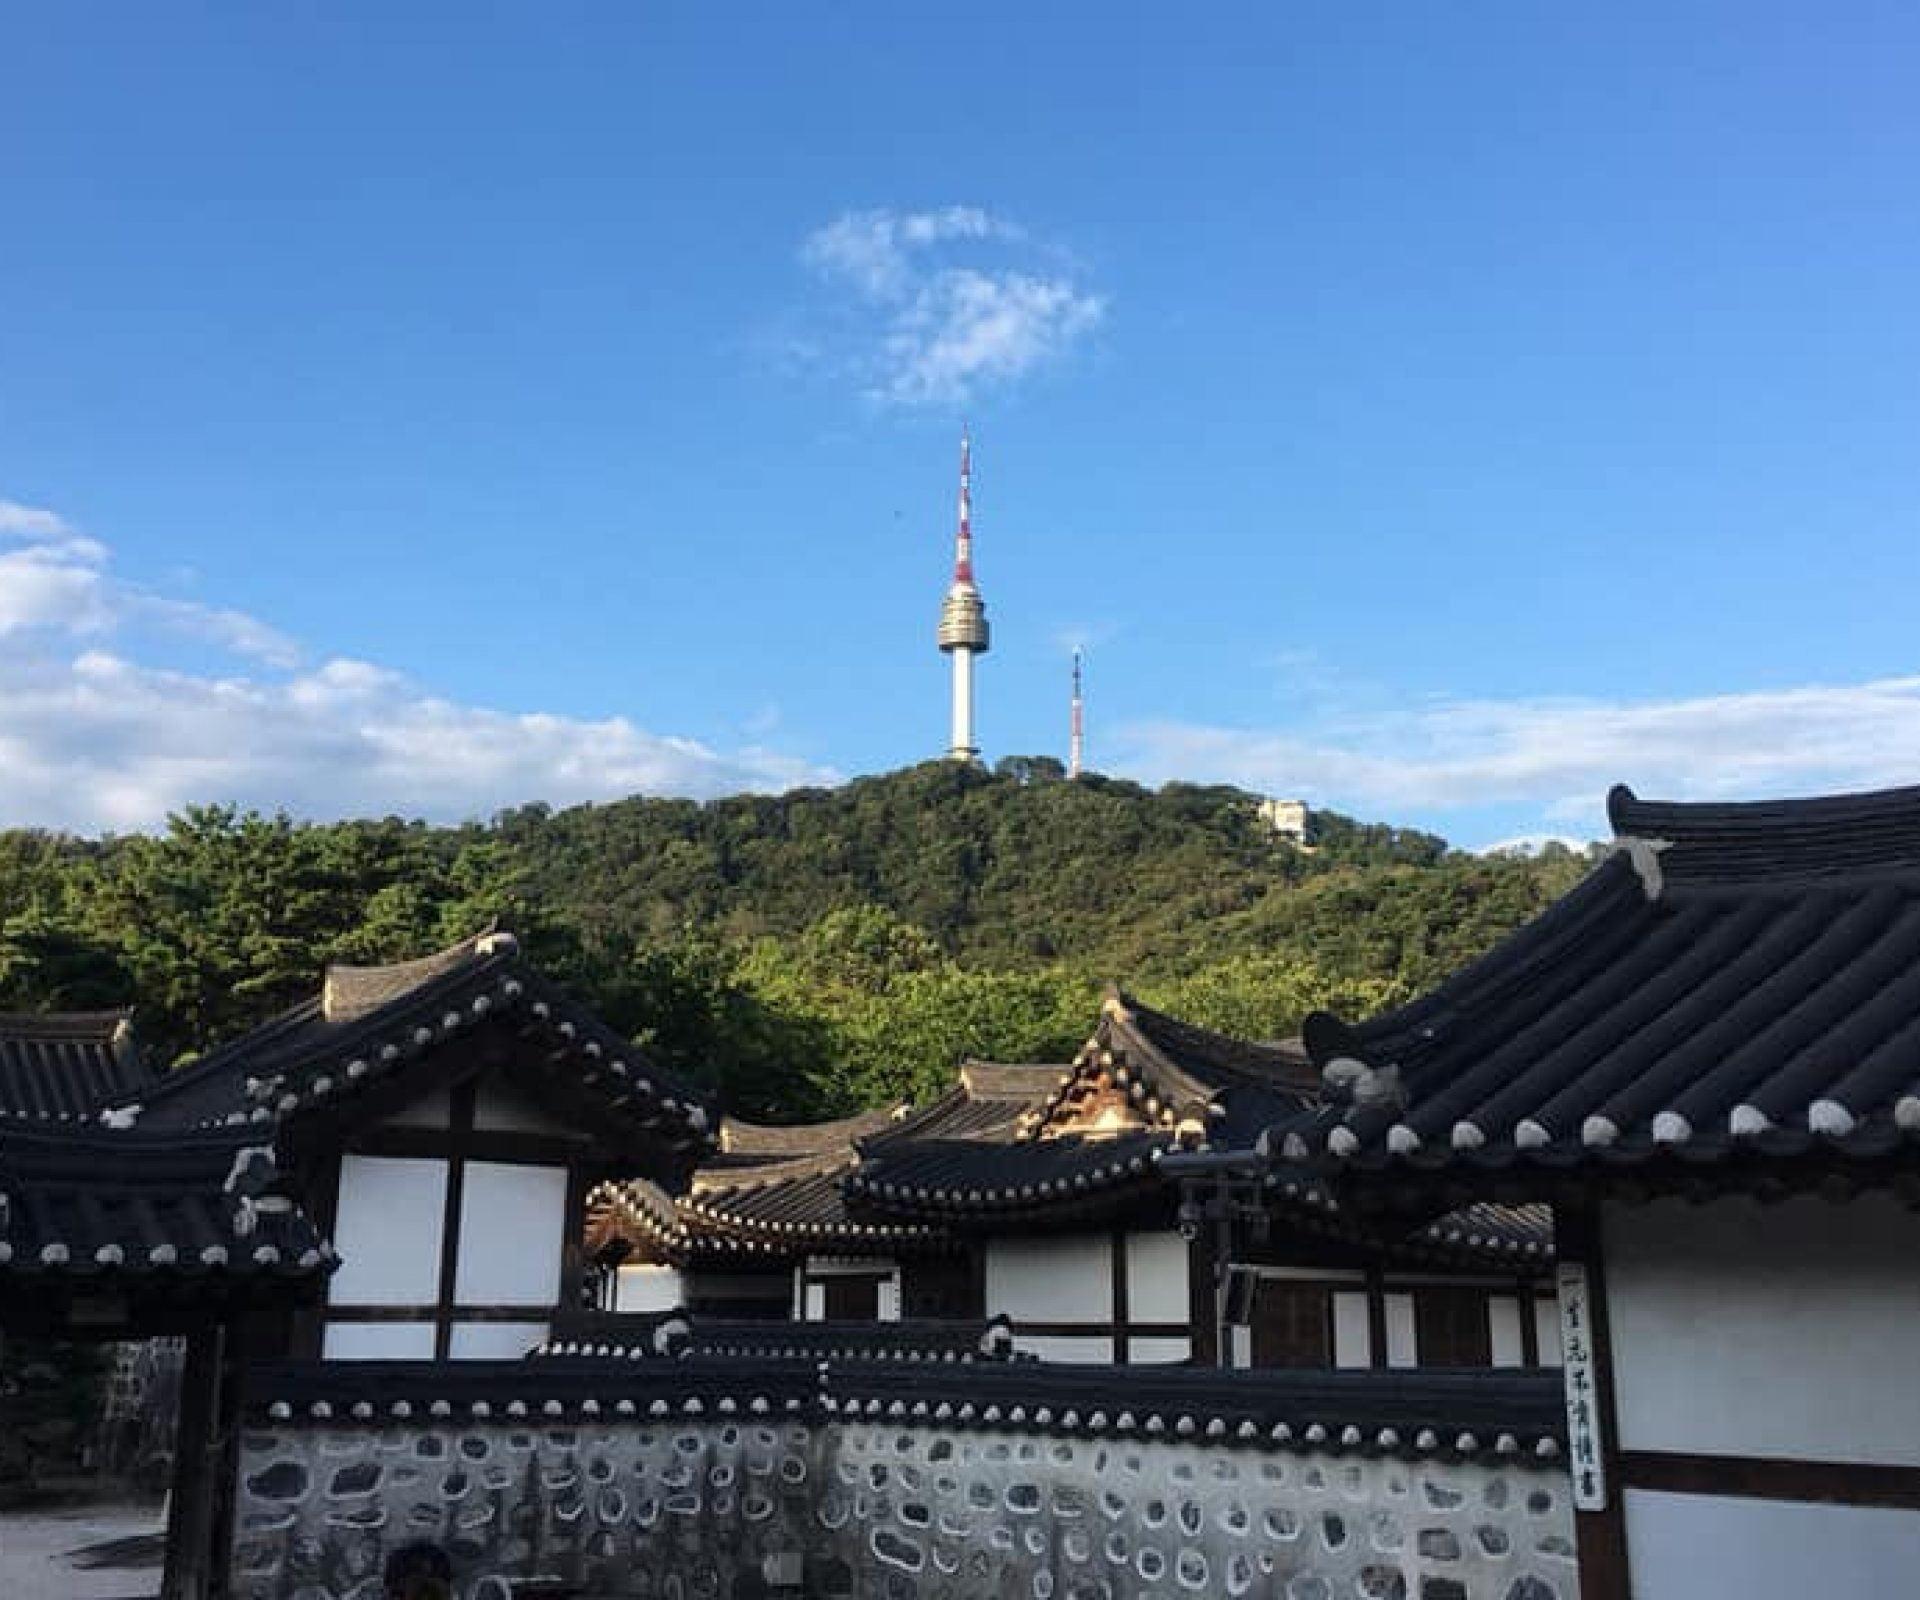 Namsangol Hanok Village | Jung-gu, Seoul